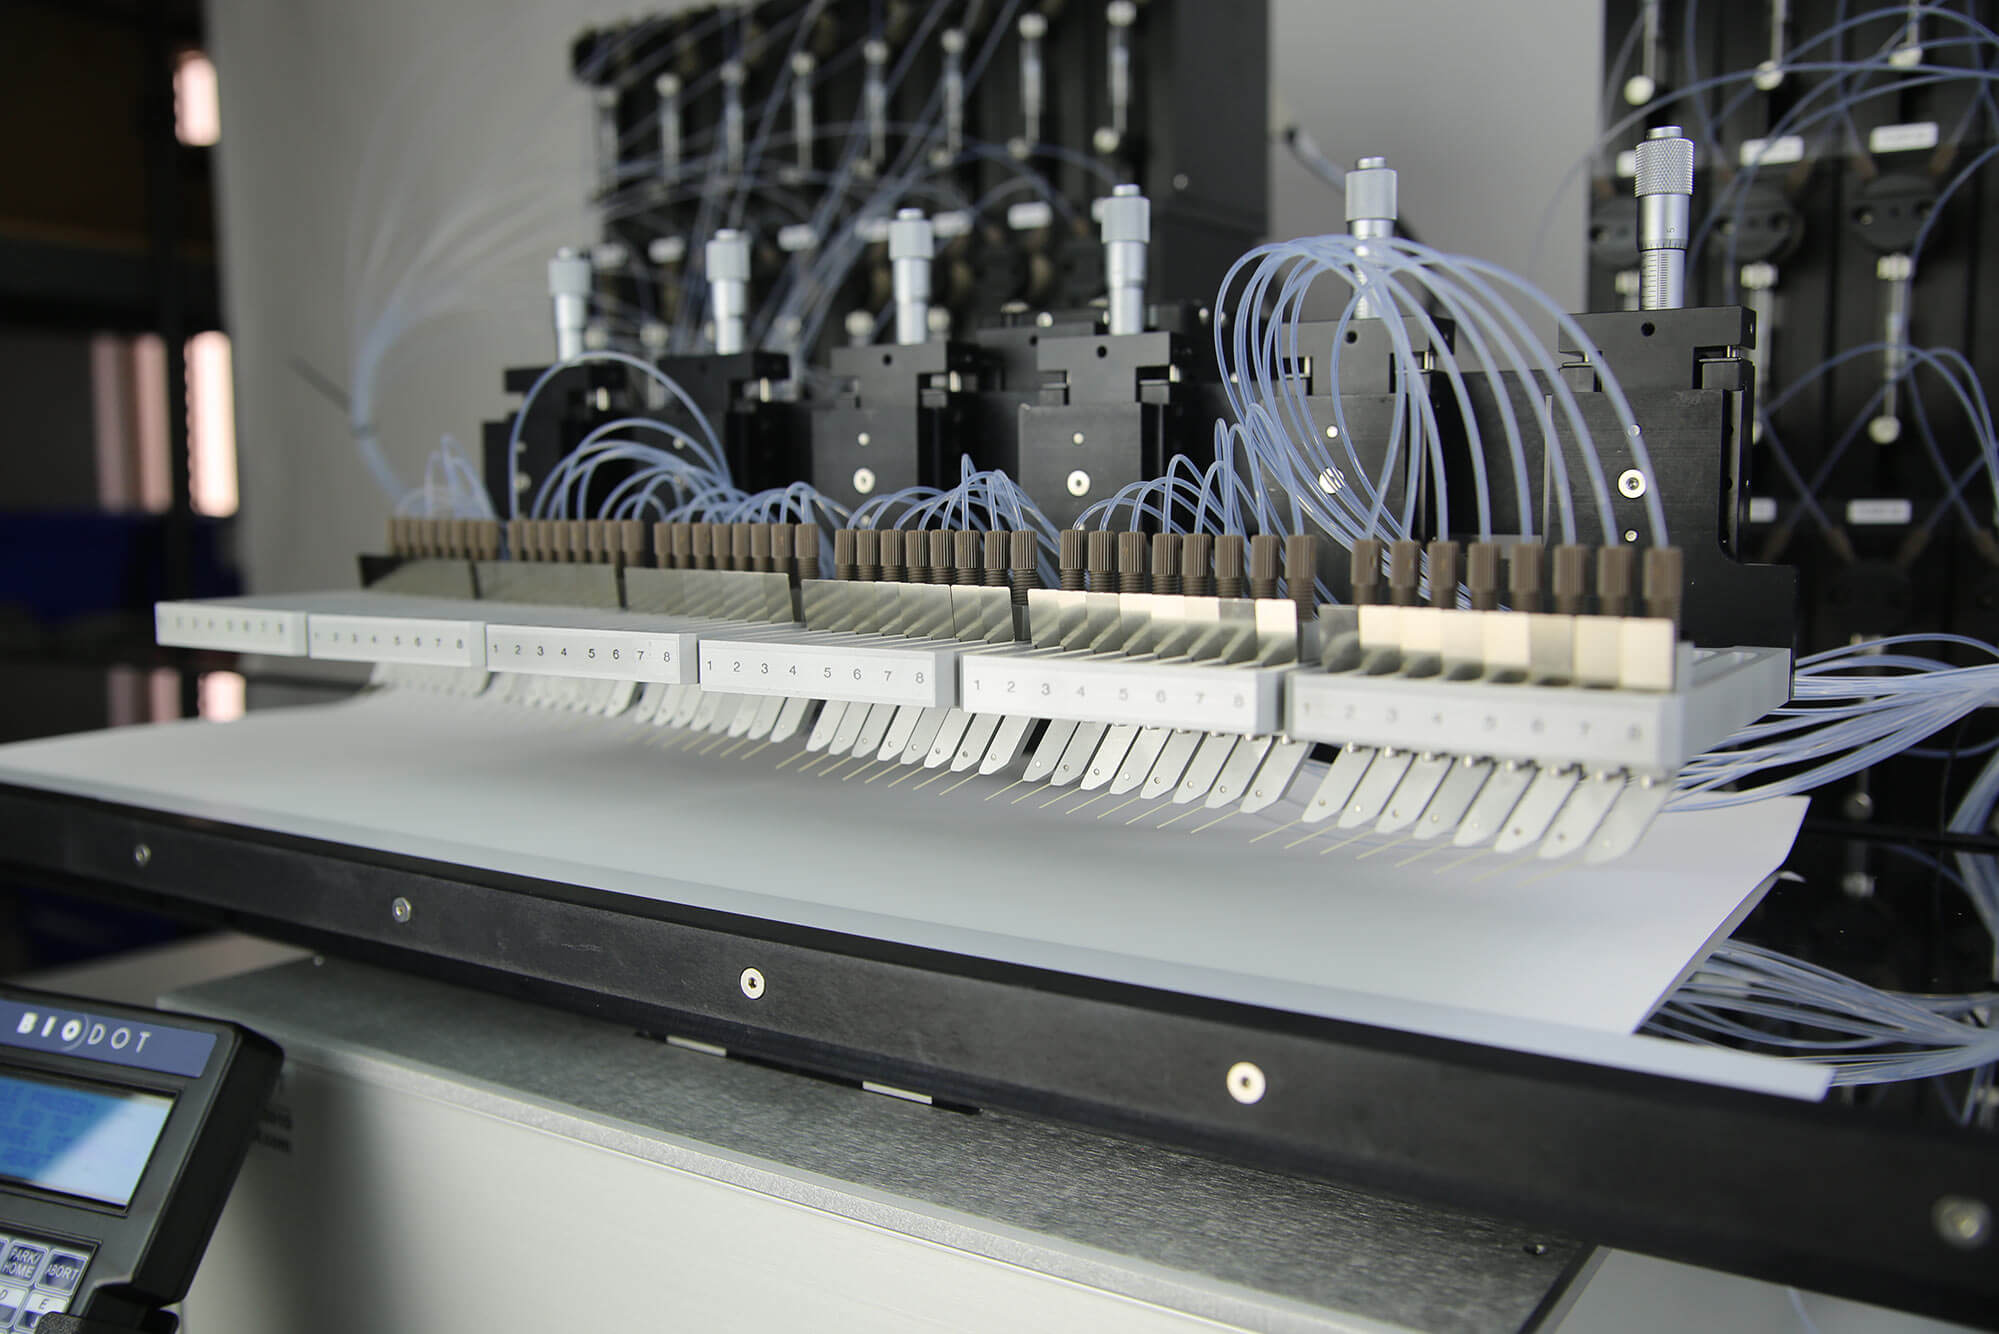 XYZ3210™-C Dispense System